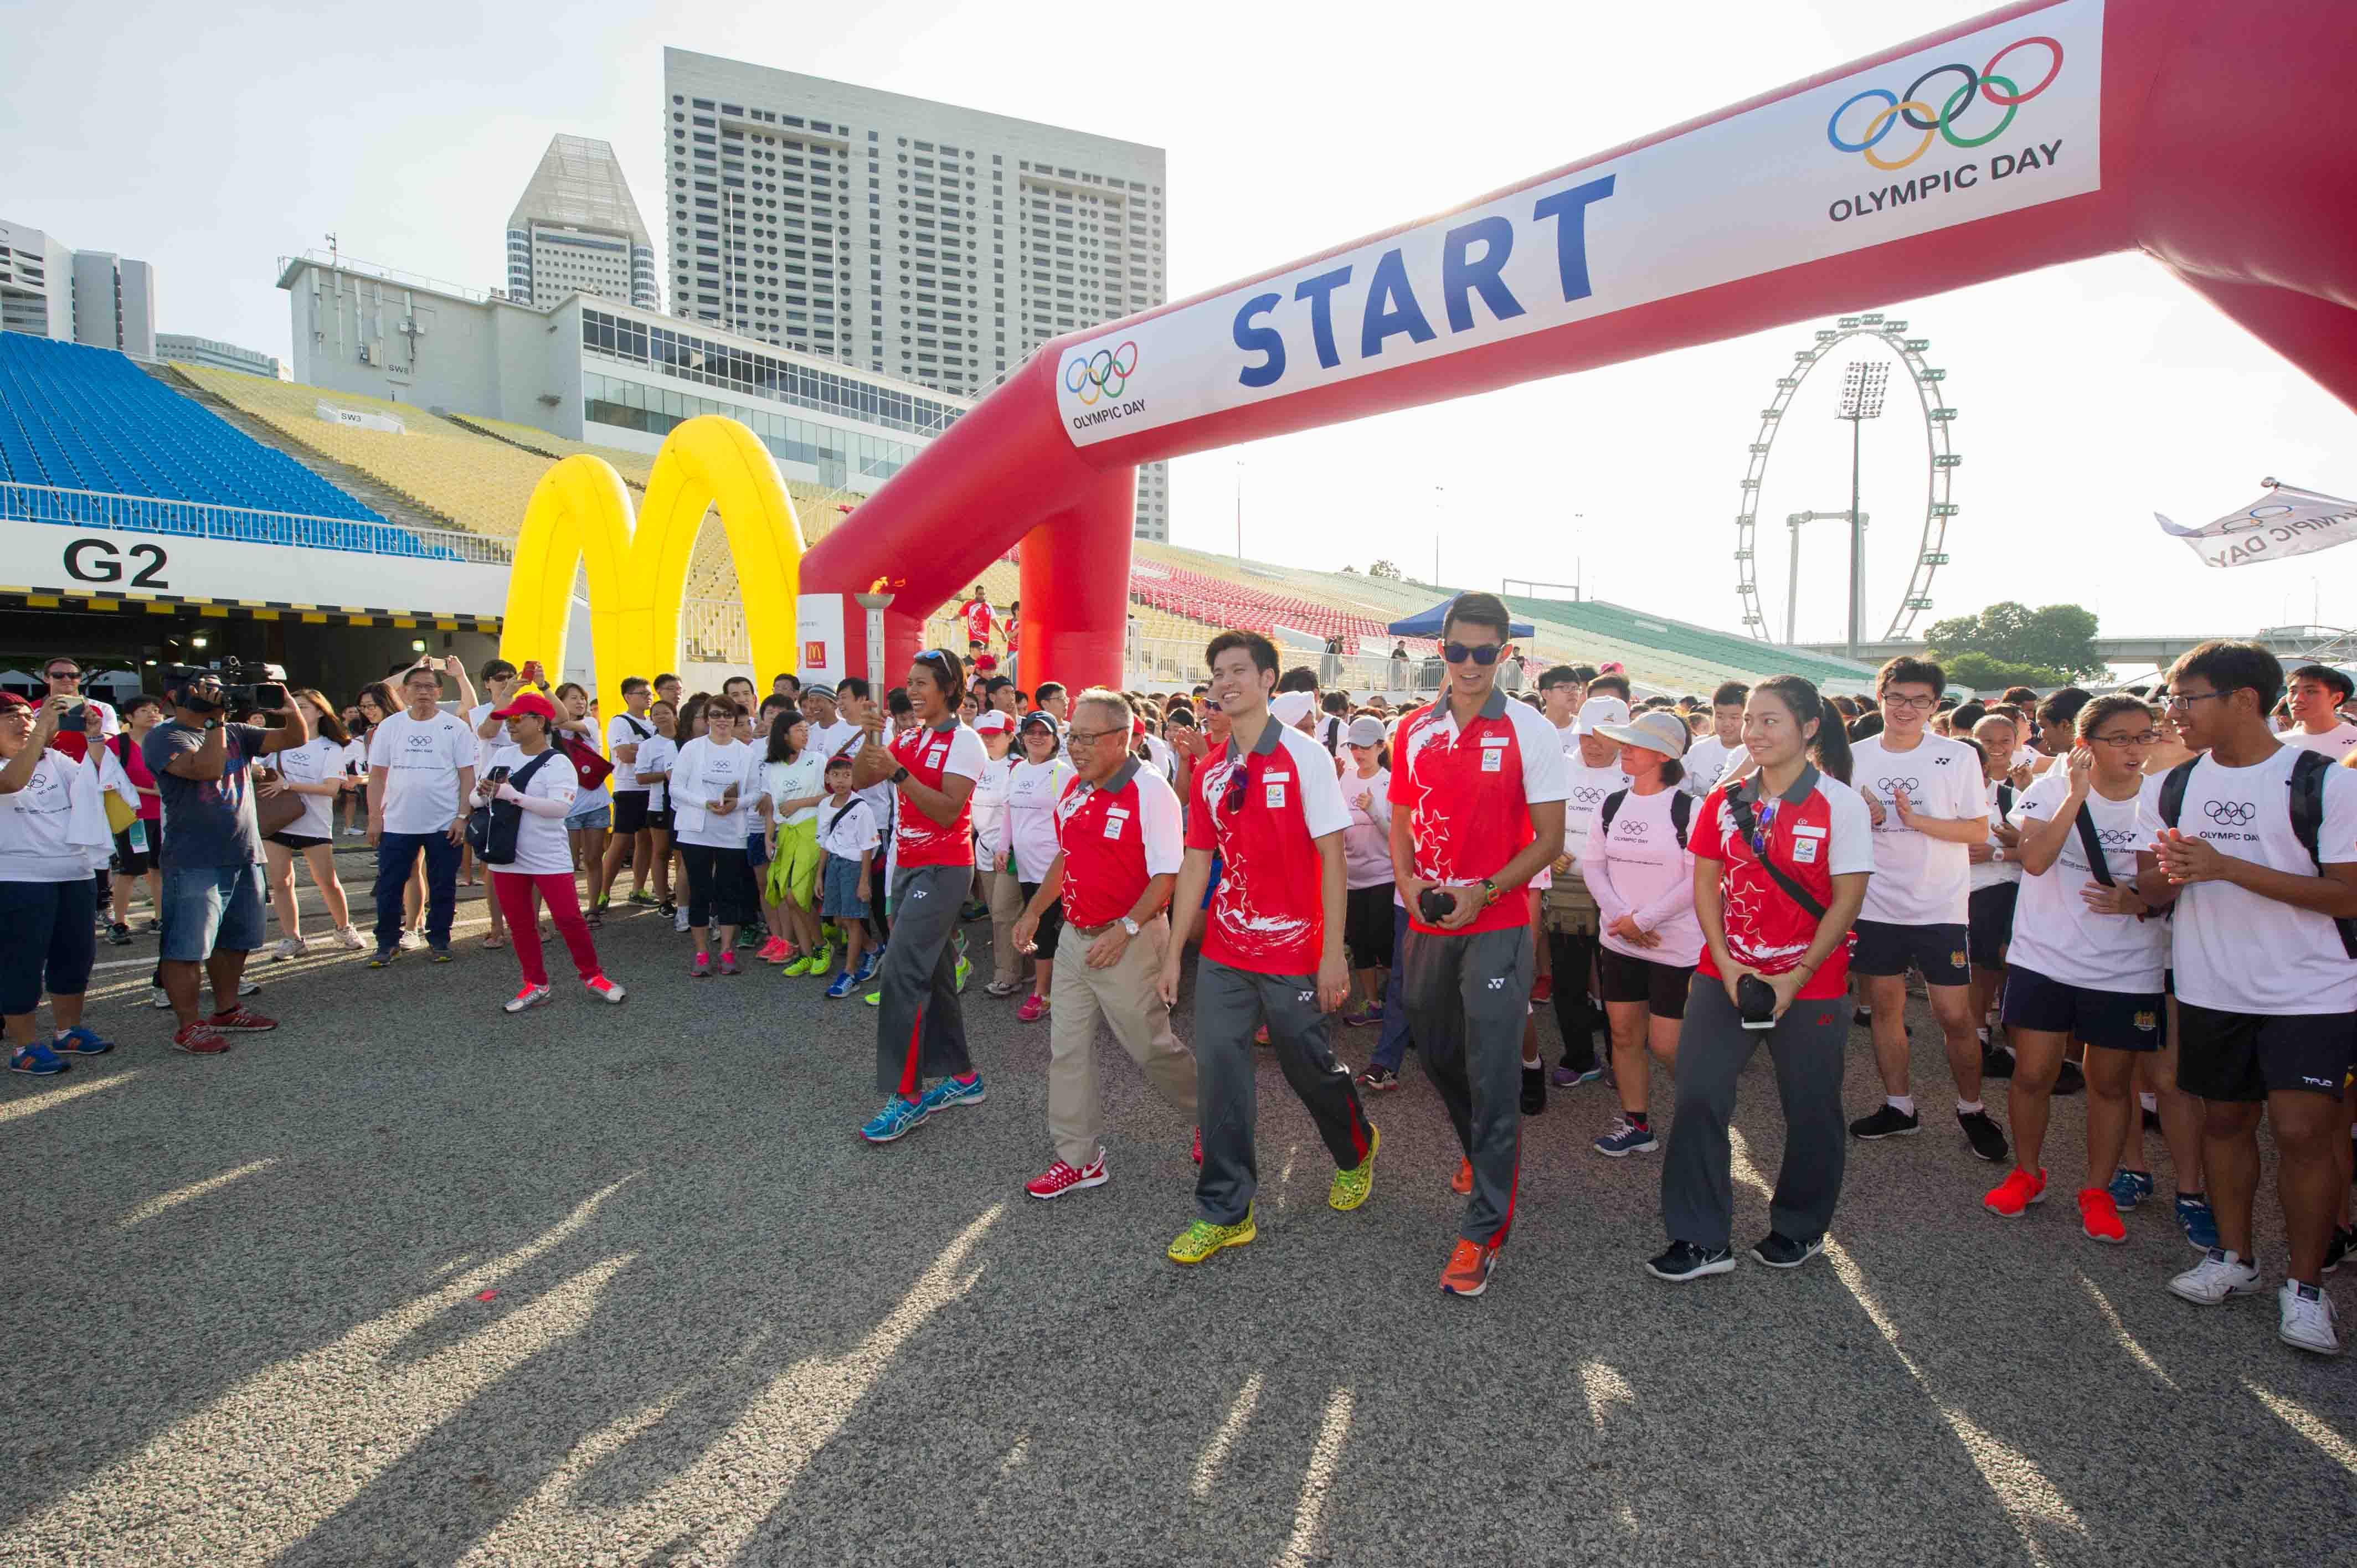 Be Active - McDonald's®